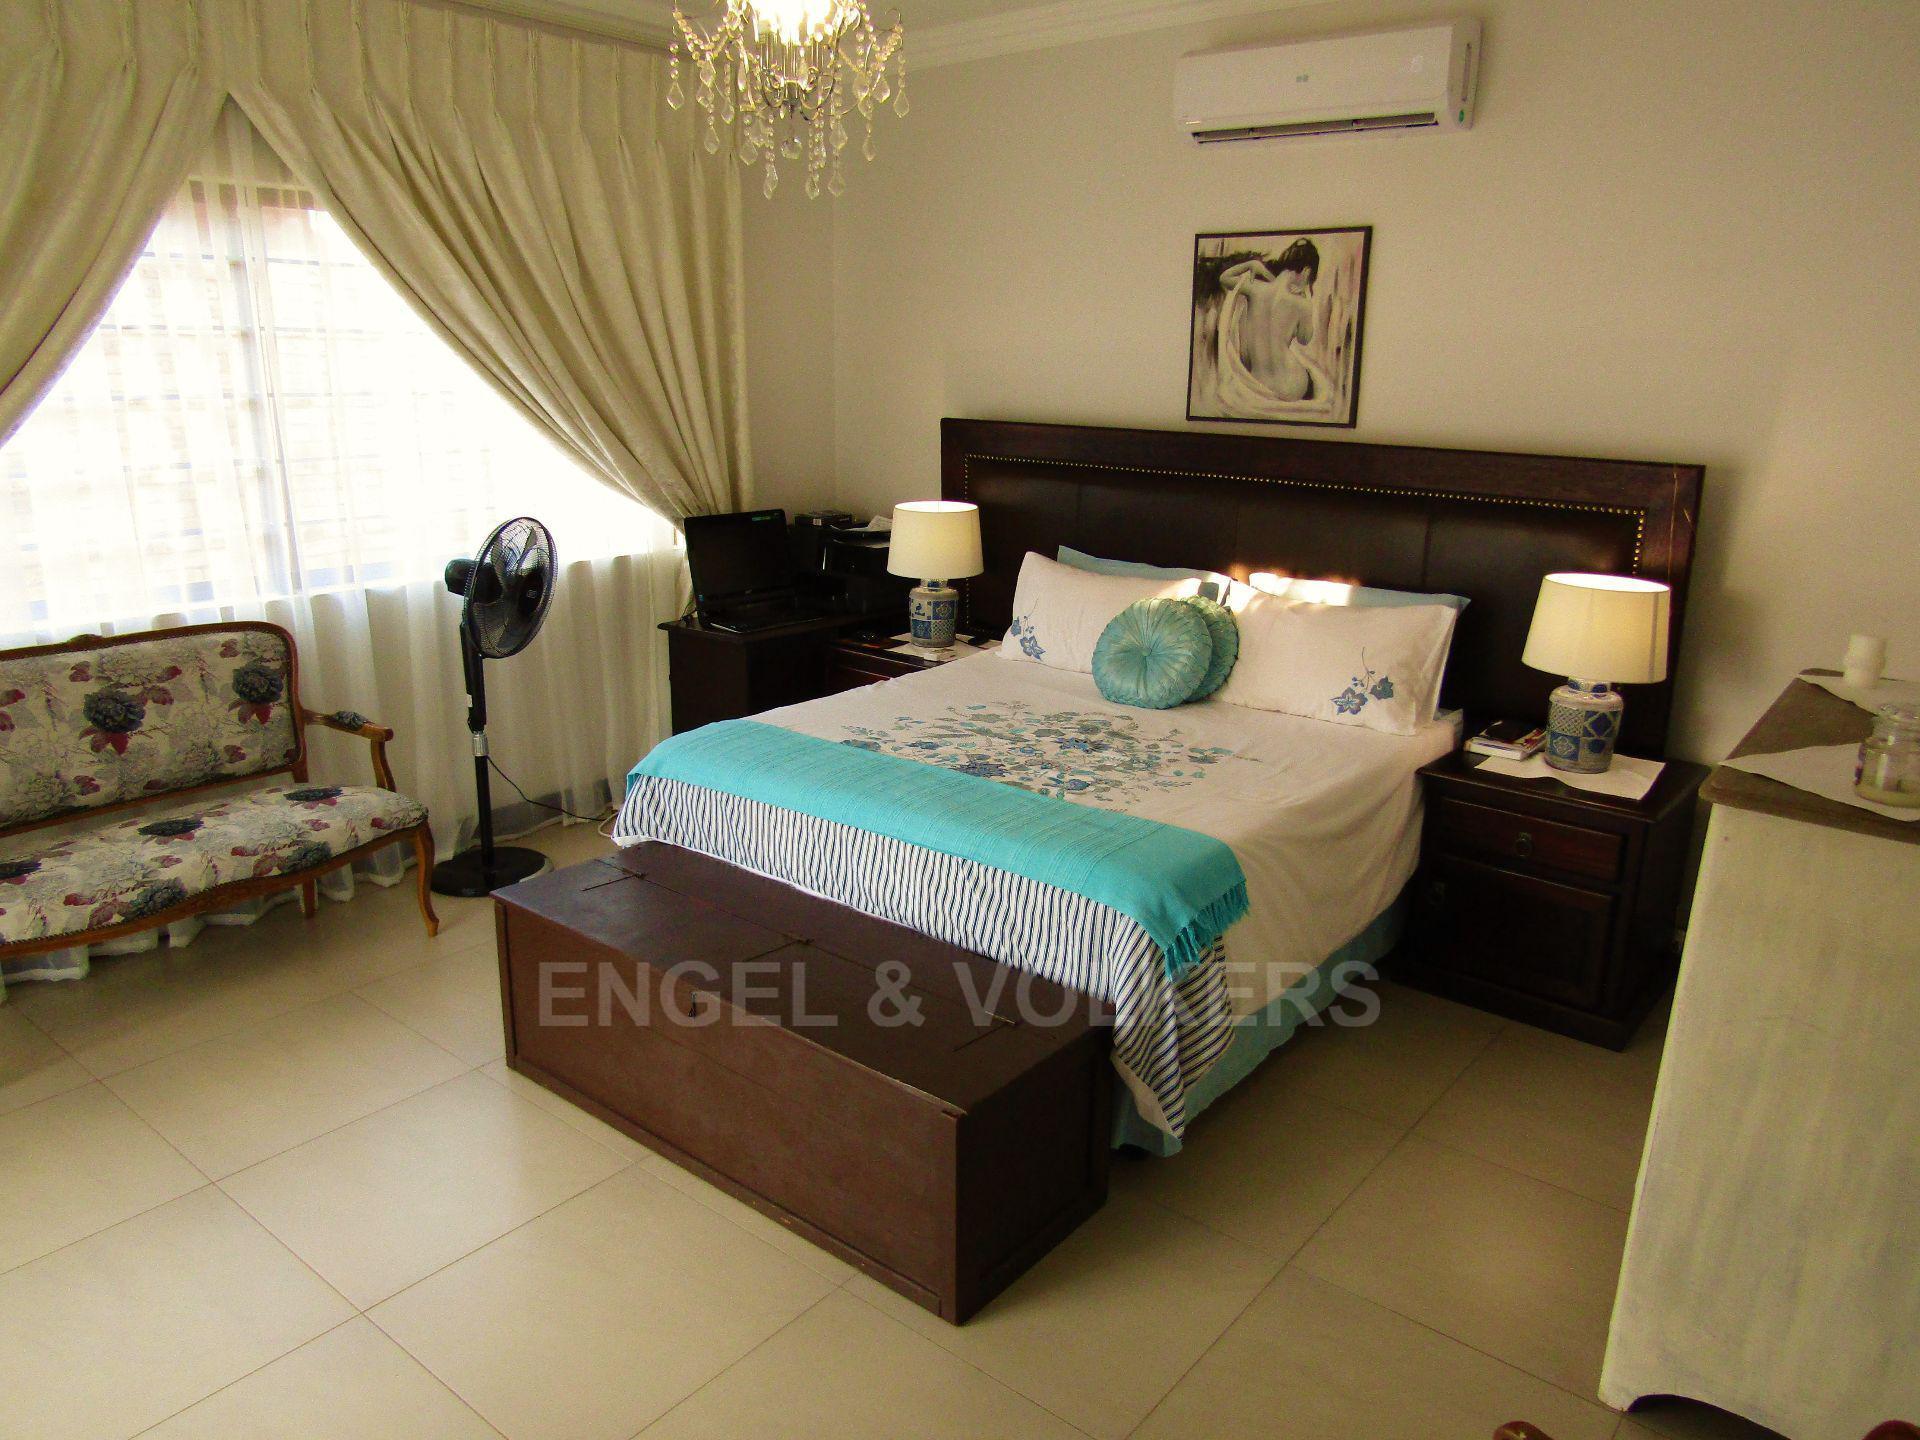 Lifestyle Estate property for sale. Ref No: 13458759. Picture no 13